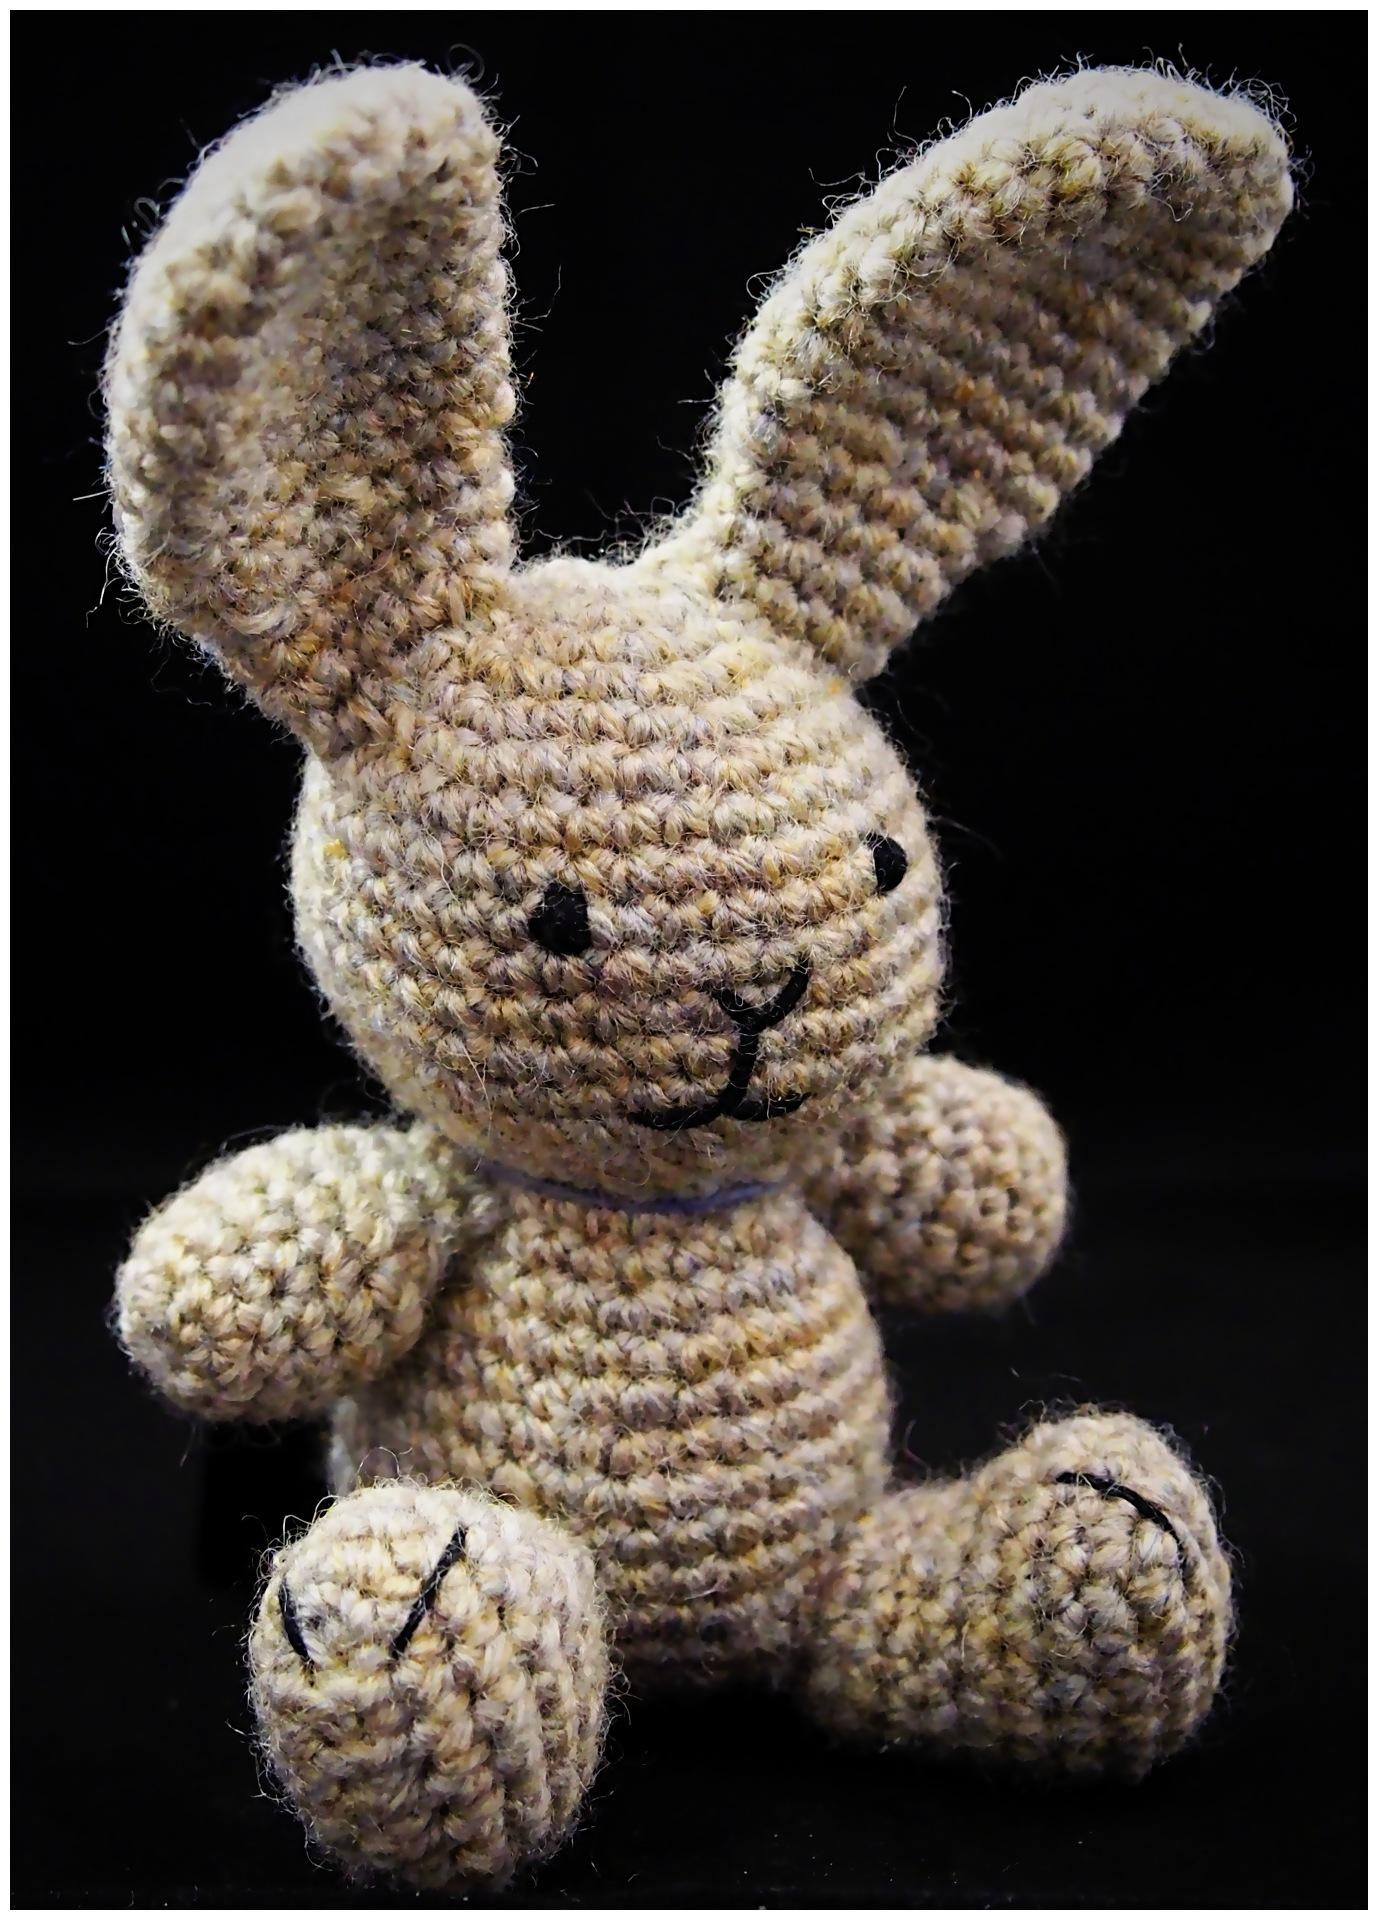 Bunny by MorpheusDreaming